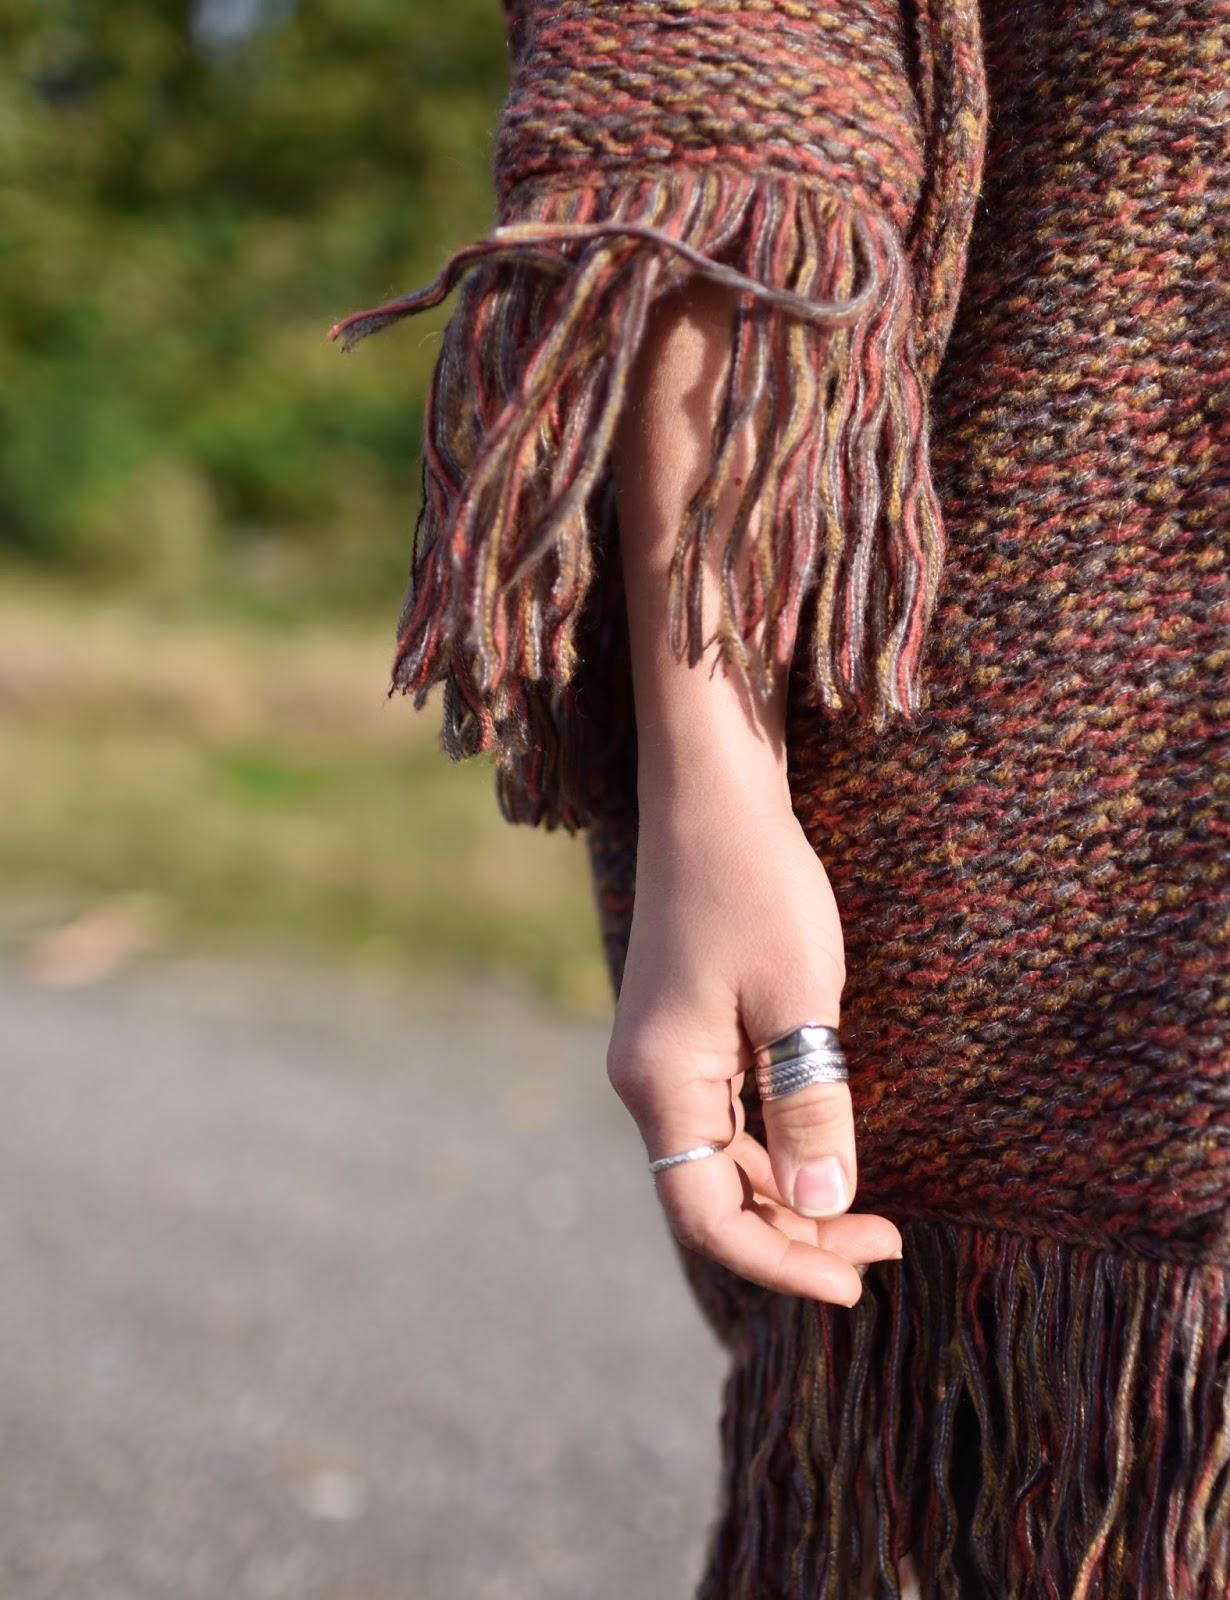 Outfit inspiration c/o Monika Faulkner - fringy poncho-sweater